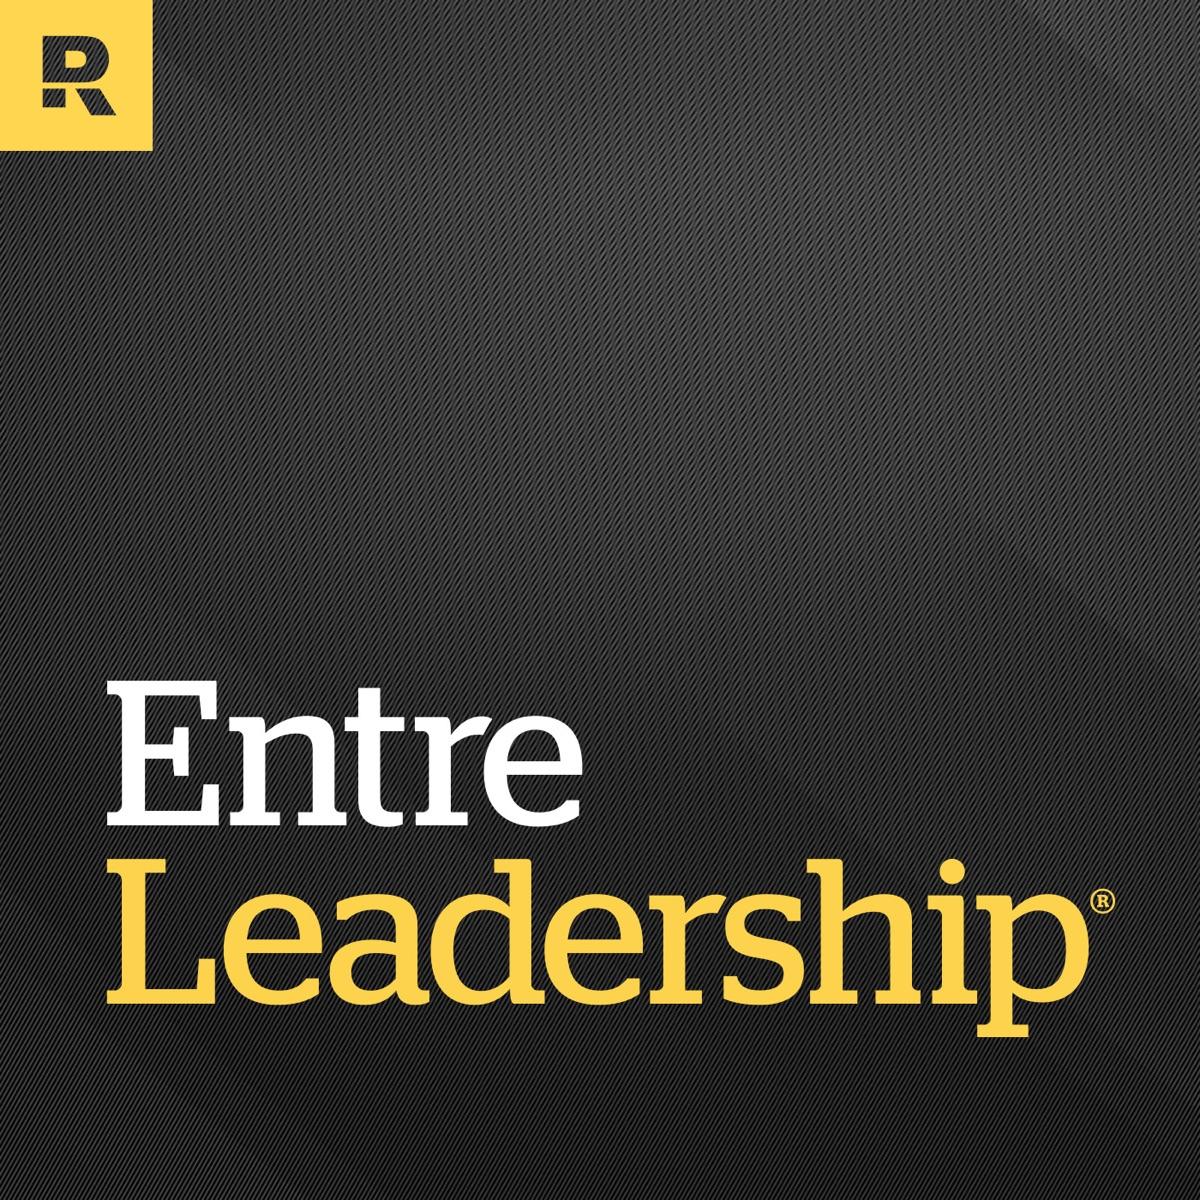 The EntreLeadership Podcast